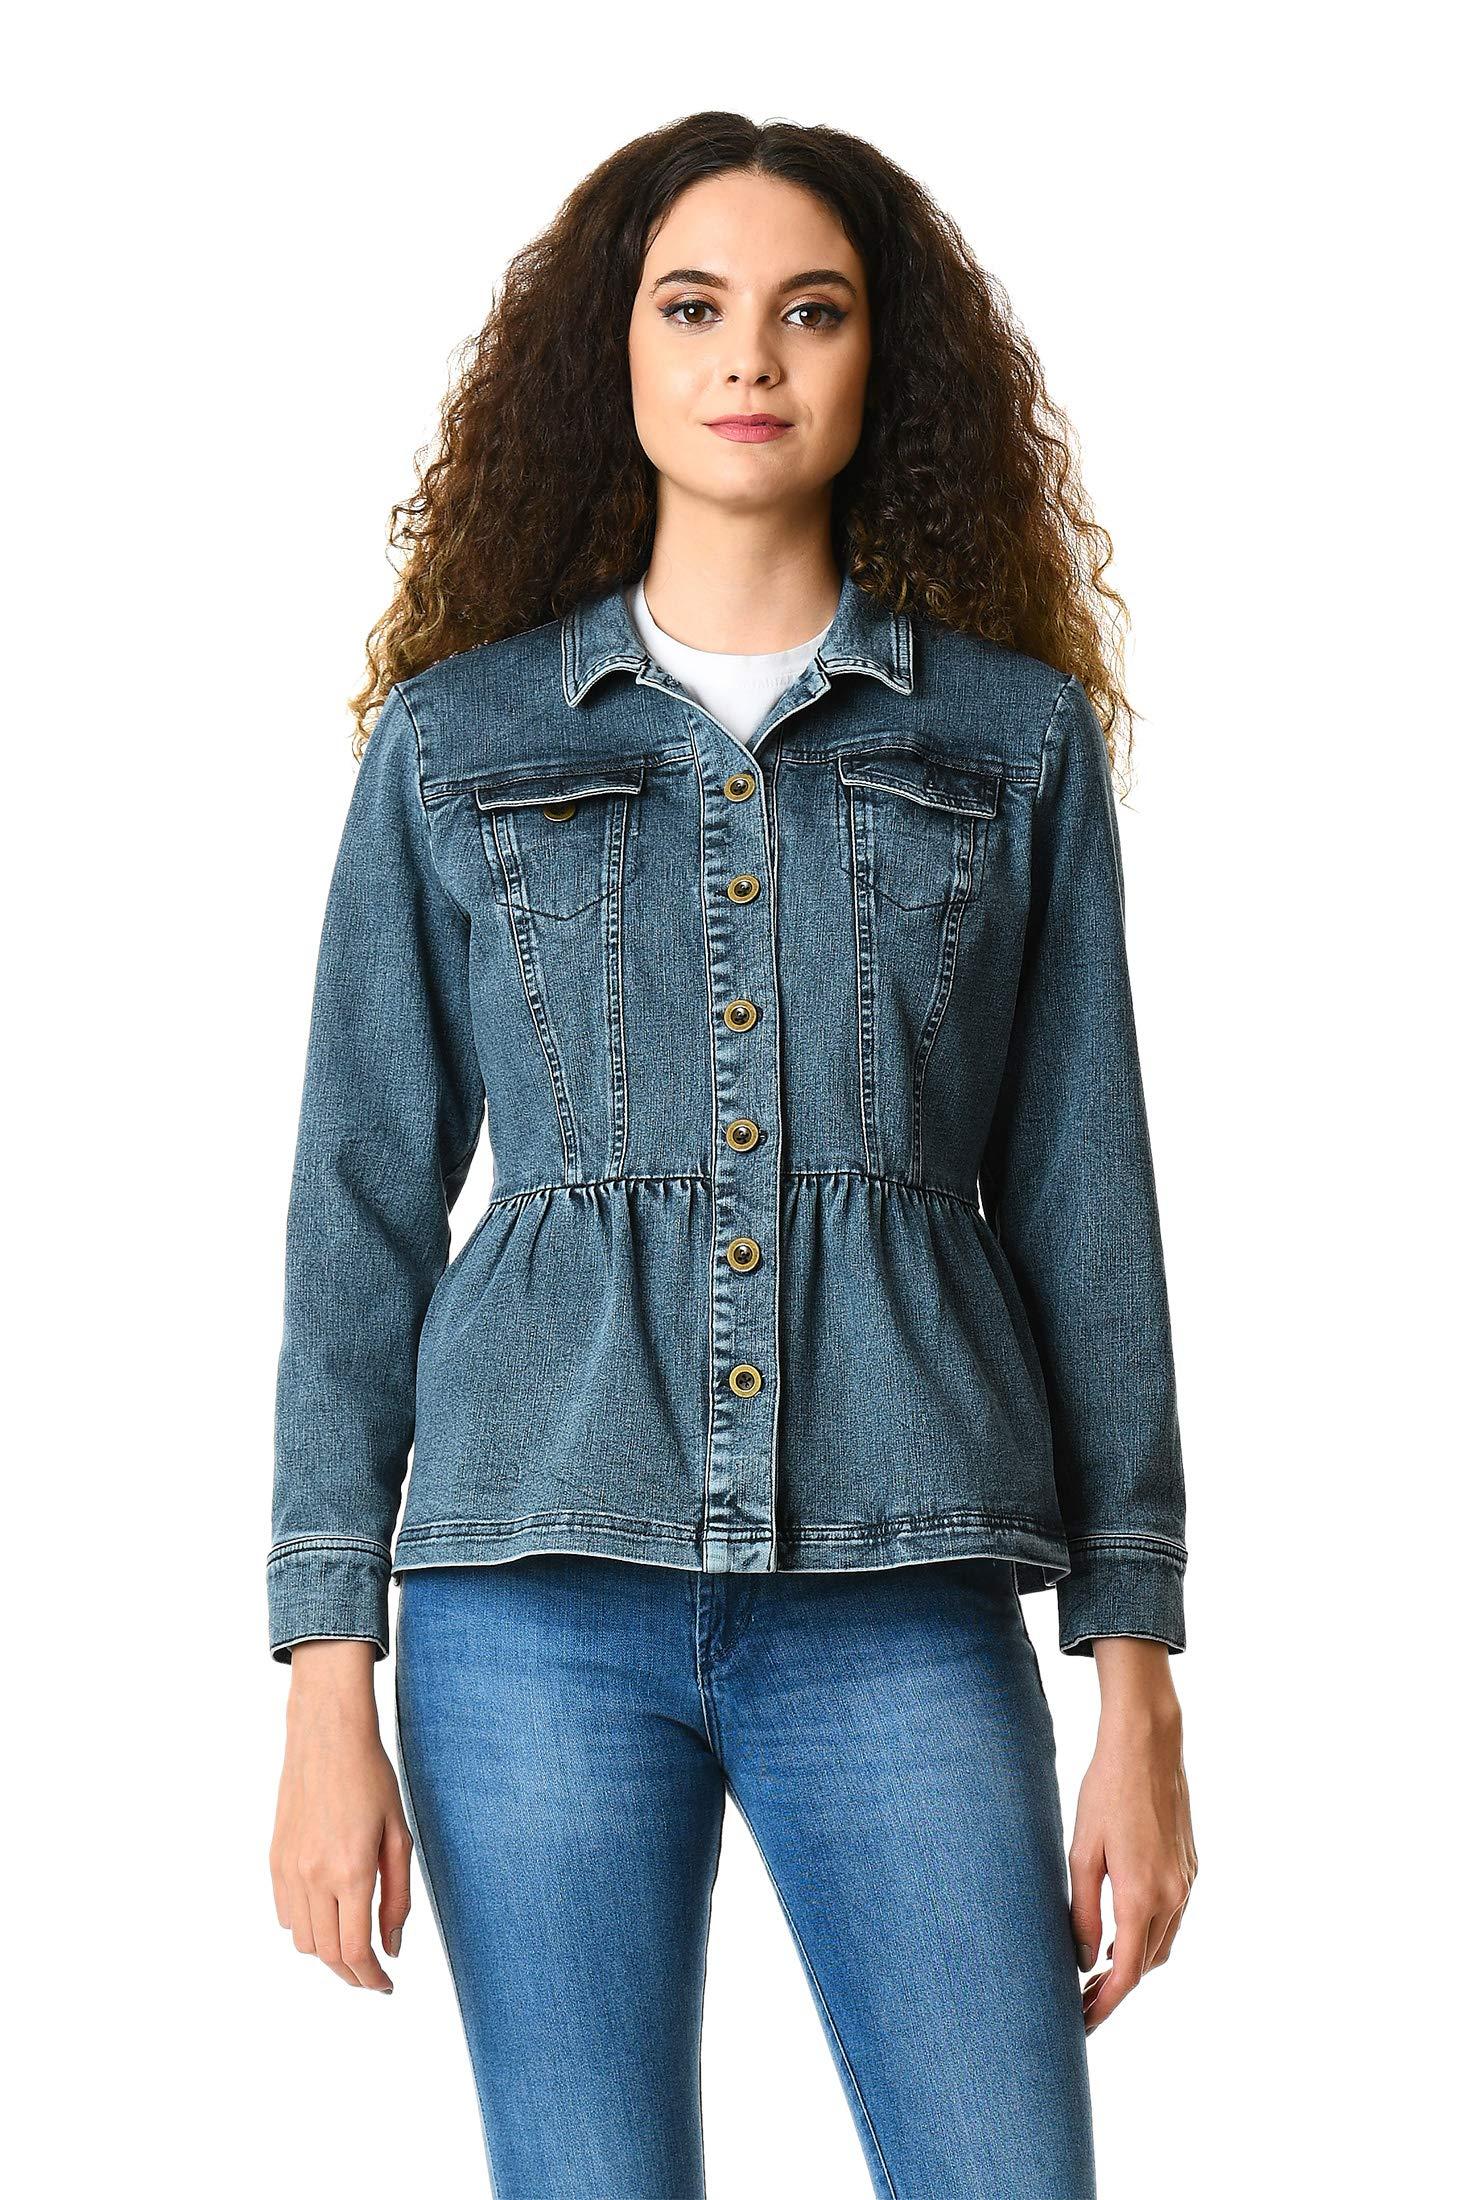 eShakti Women's Vintage wash Denim Peplum Jacket 3X-26W Short Indigo